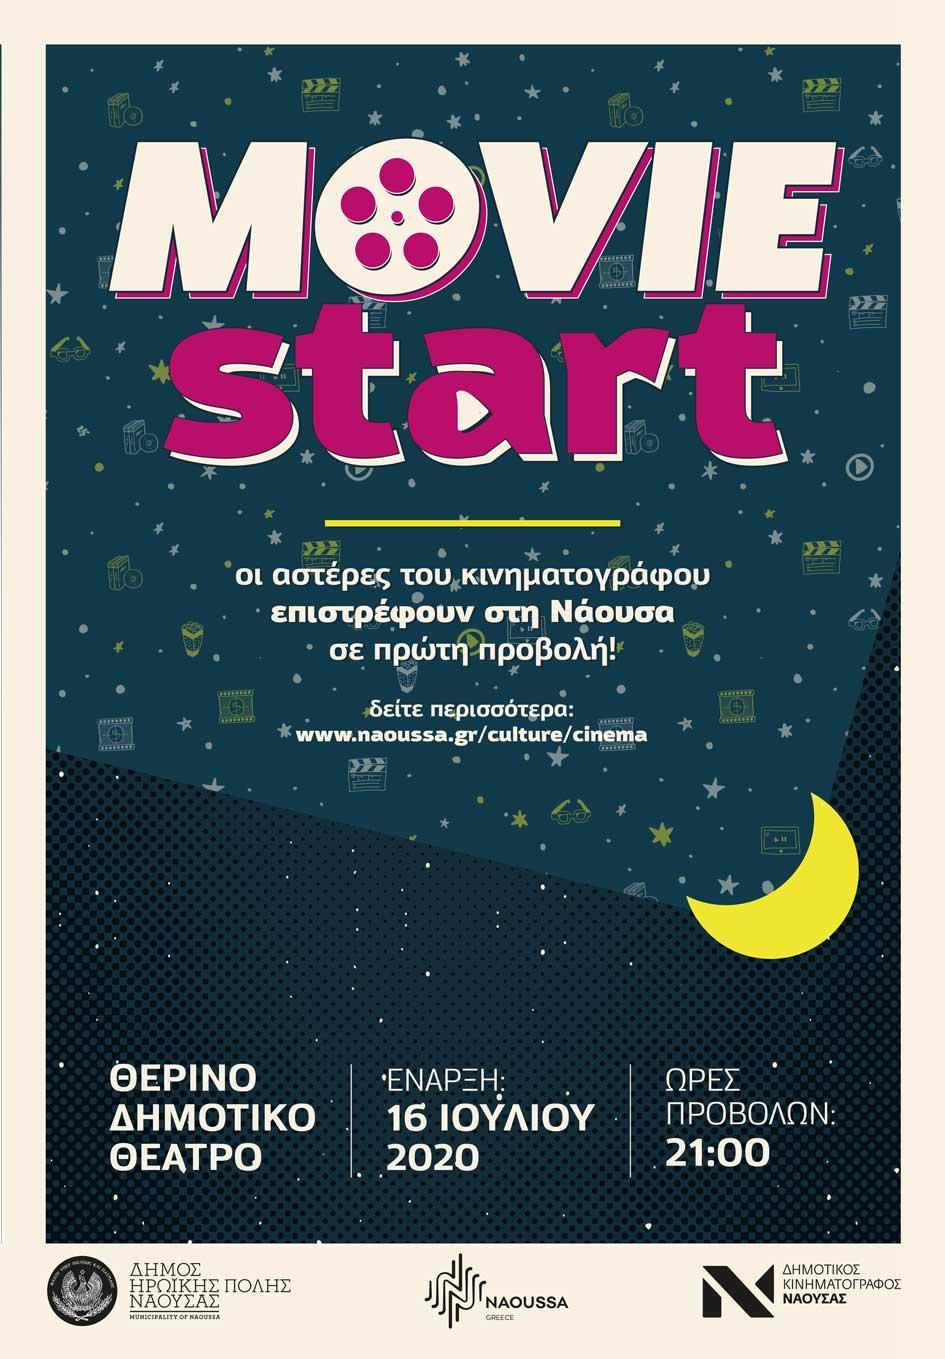 «Moviestart», ο θερινός κινηματογράφος επιστρέφει στη Νάουσα!